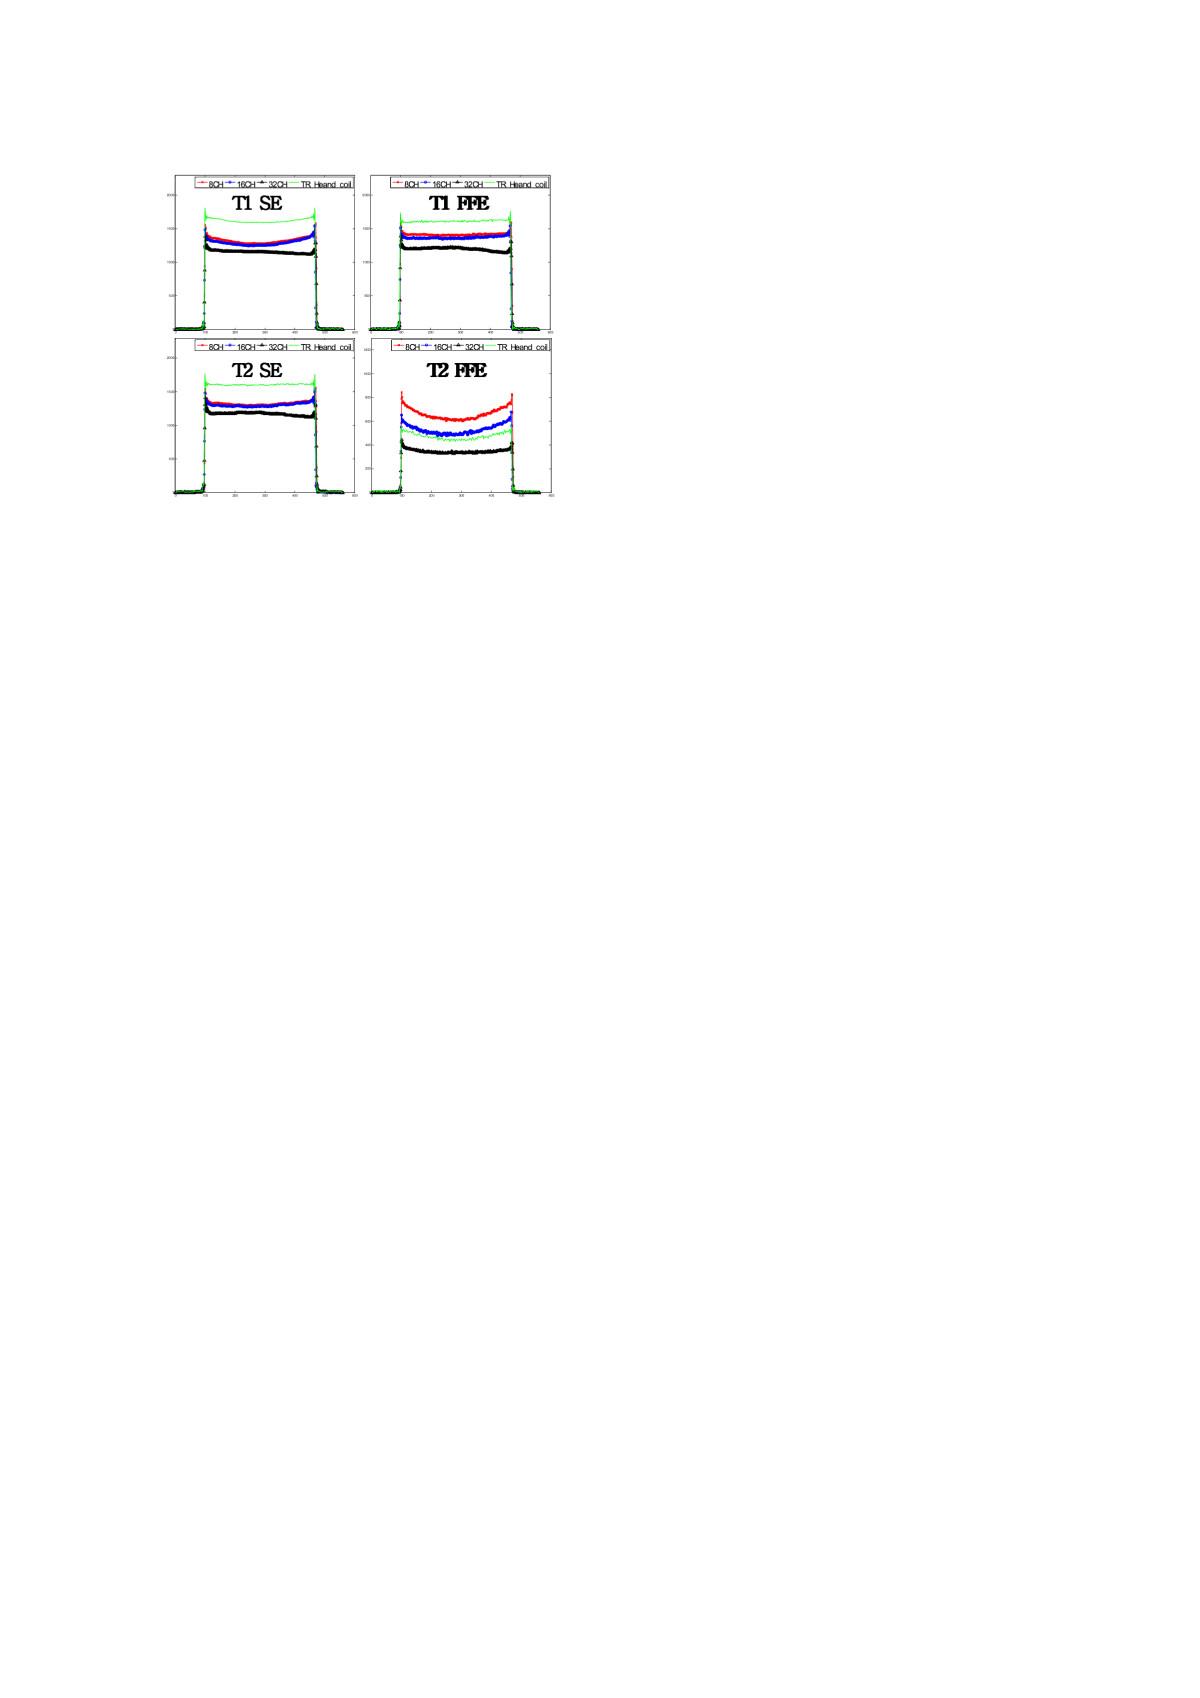 https://static-content.springer.com/image/art%3A10.1186%2Fs40543-014-0025-2/MediaObjects/40543_2014_Article_25_Fig4_HTML.jpg